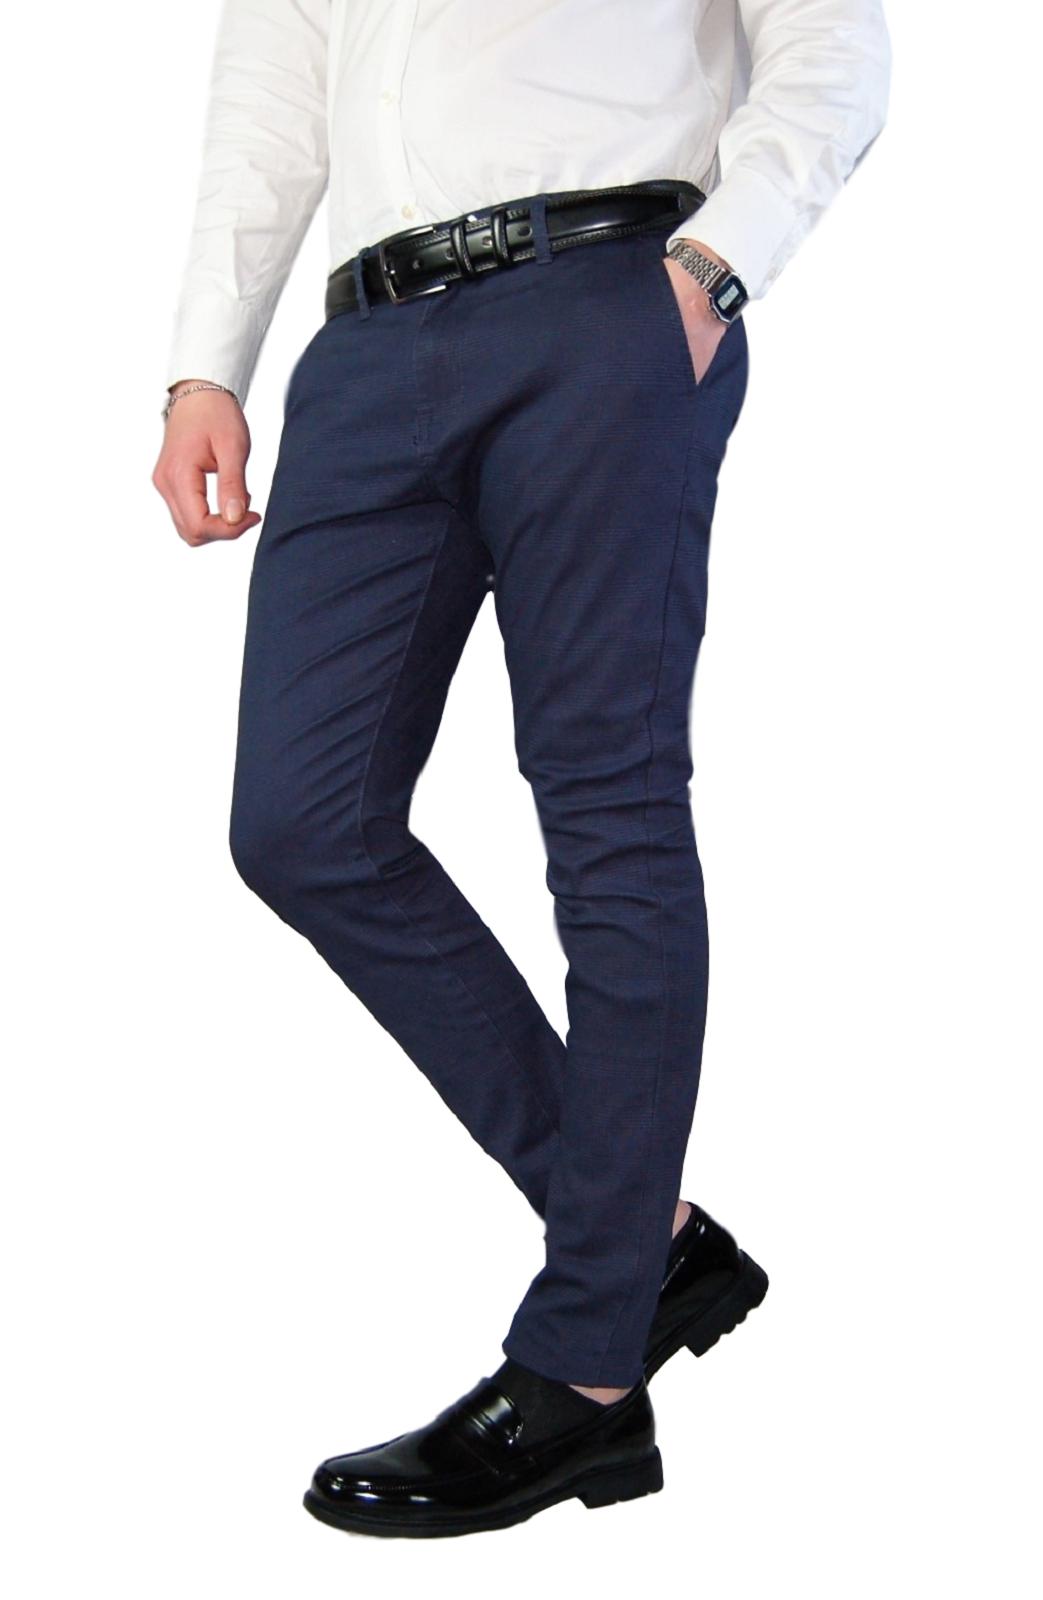 Pantalone-Uomo-Chino-Slim-Fit-Elegante-Quadri-Principe-di-Galles-Invernale miniatura 10